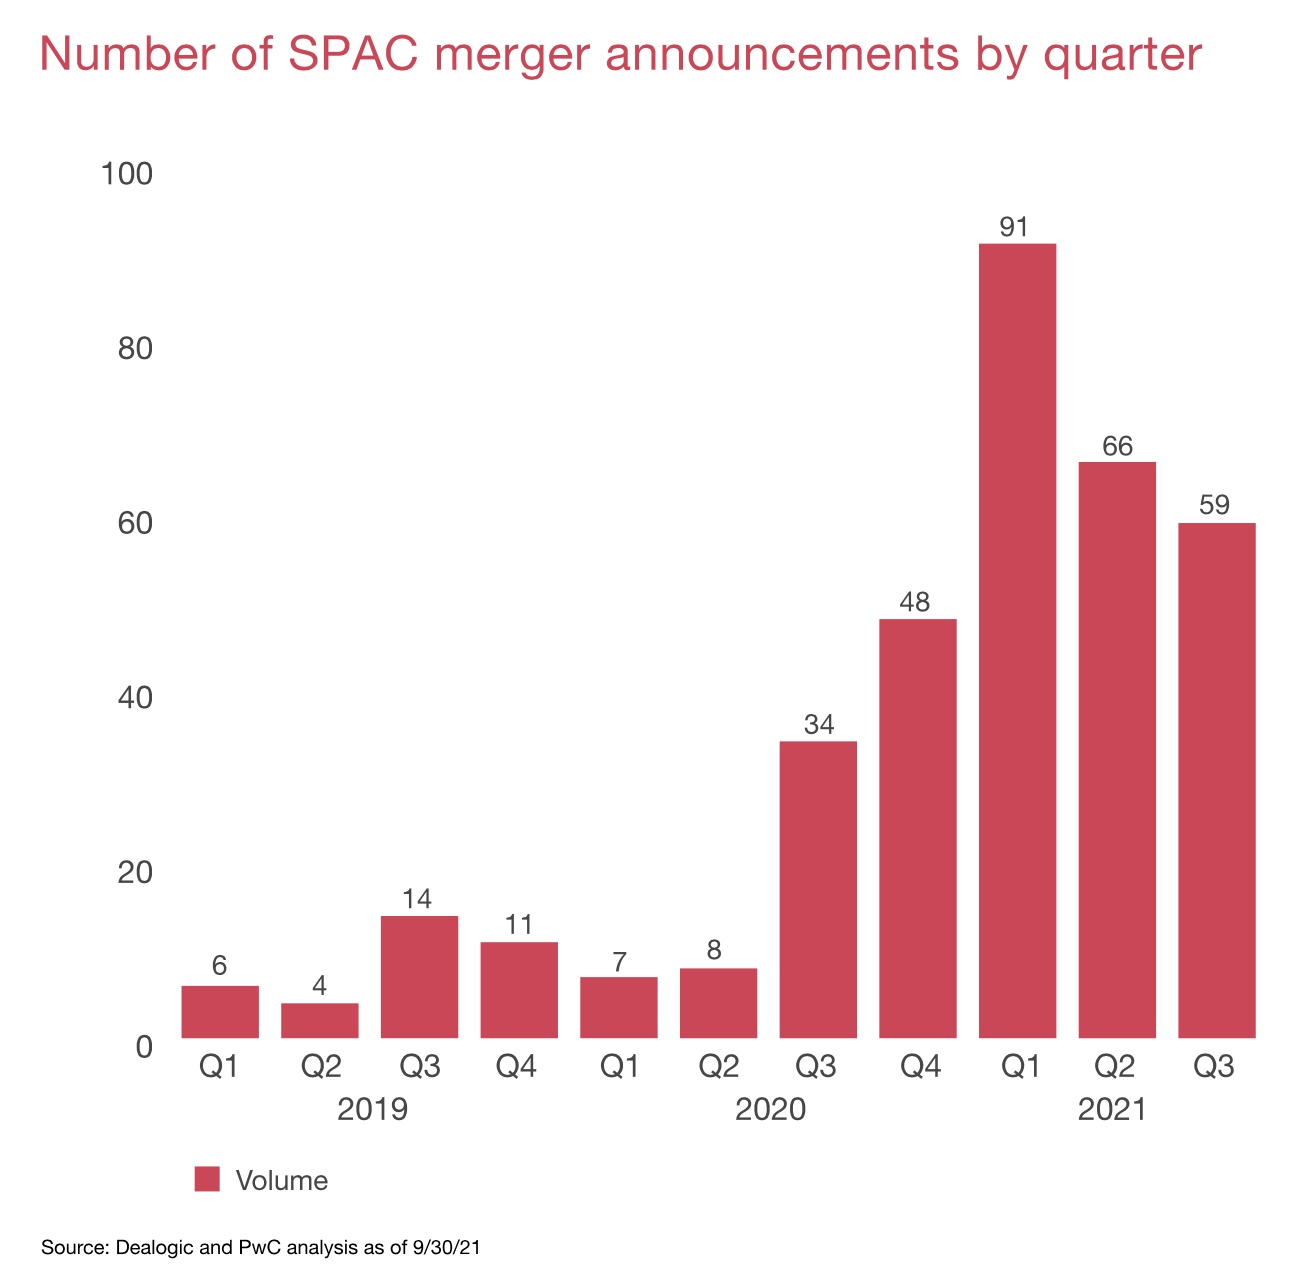 SPACs Growth 2021 Q3 Mergers